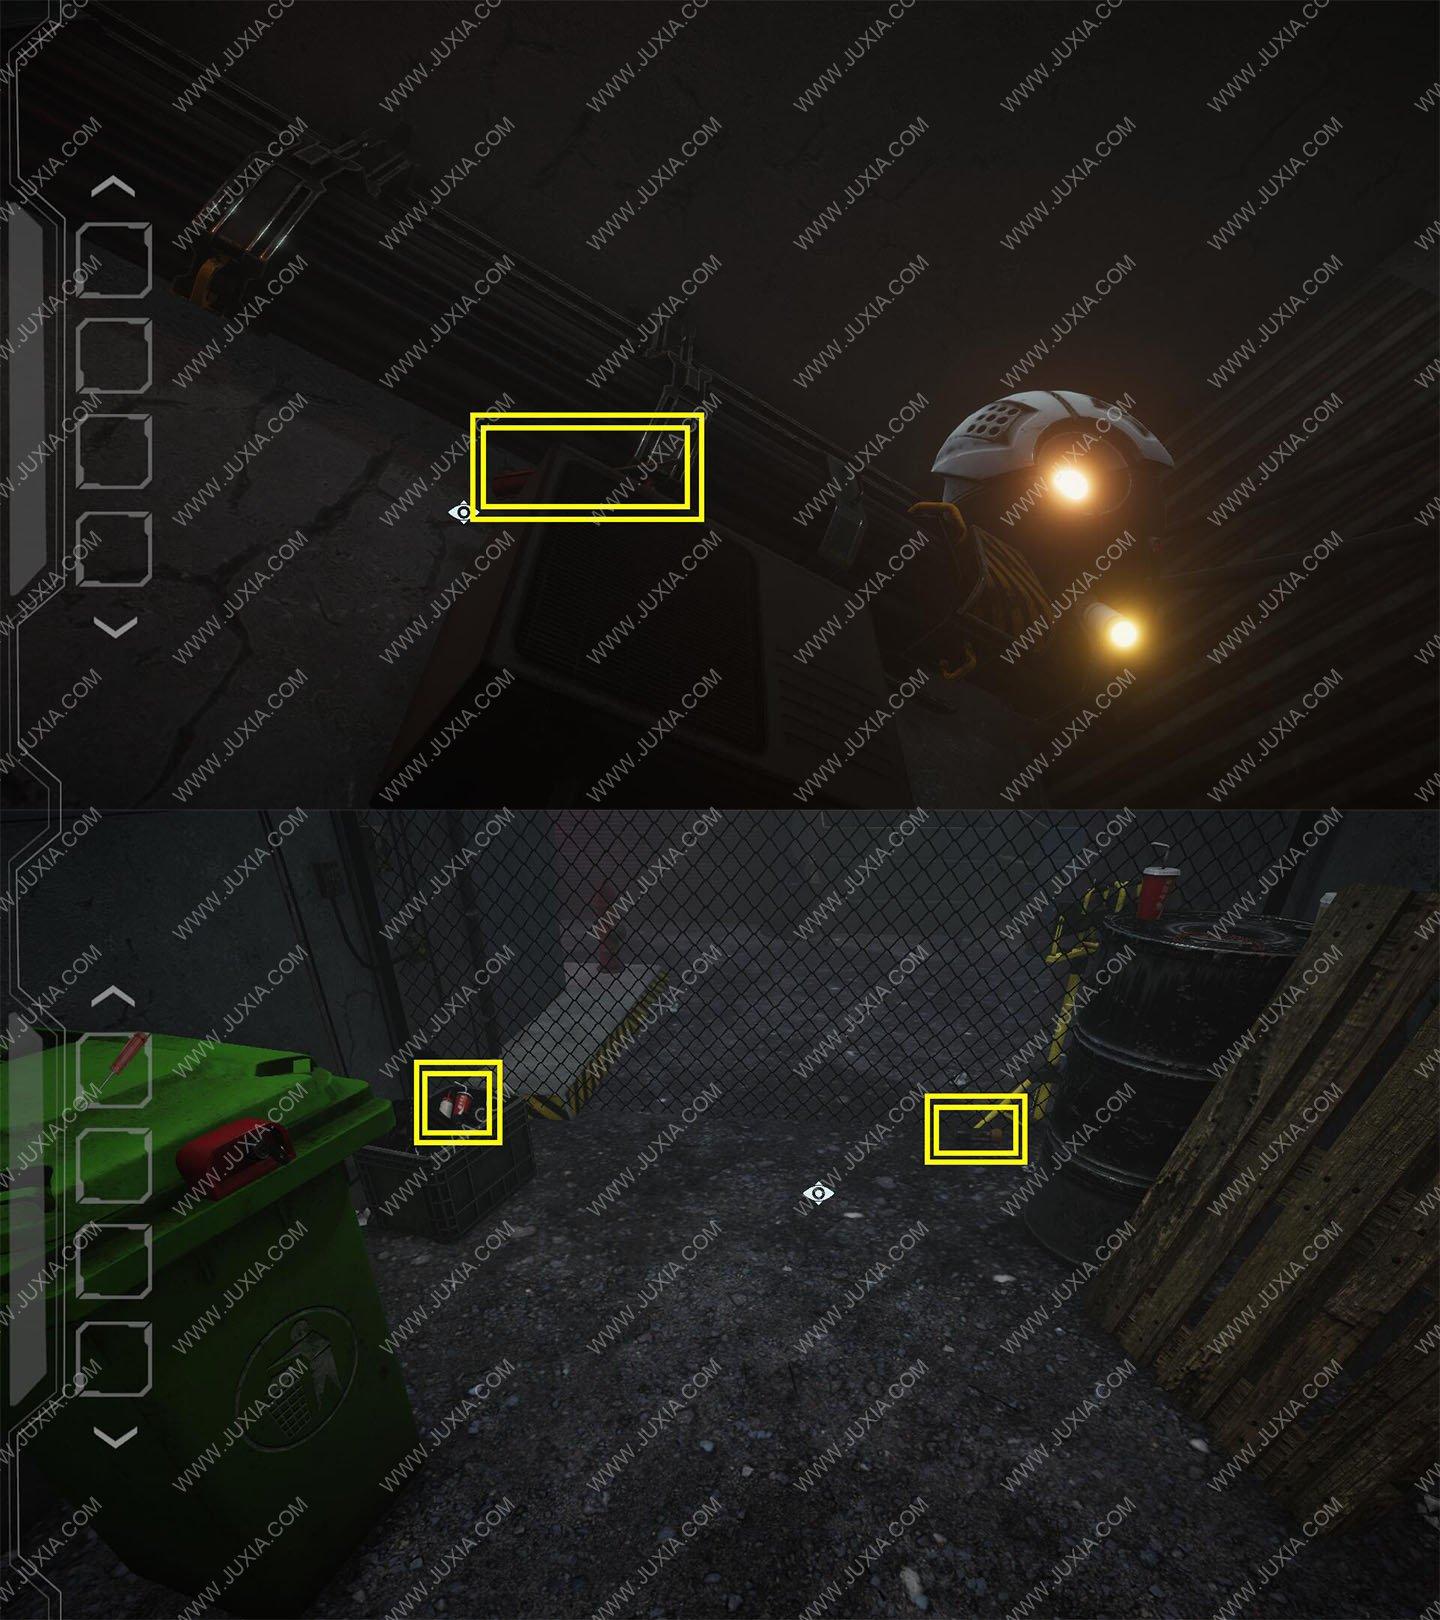 Escape2088攻略磁铁怎么获得 逃生2088攻略第三章垃圾桶怎么打开